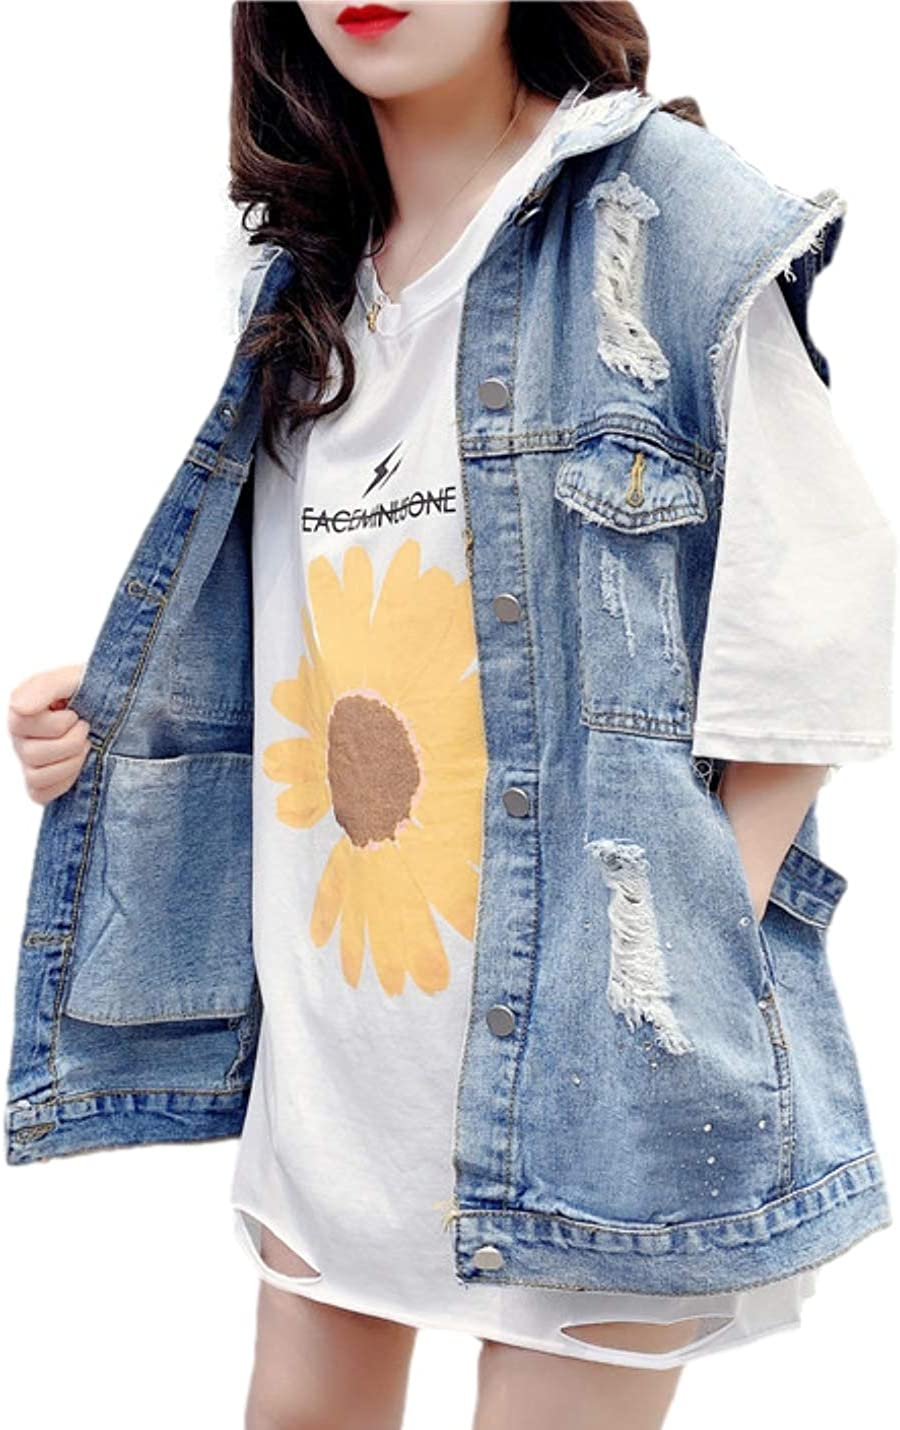 Bnigung Women's Distressed Sleevelss Denim Vest Casual Oversized Ripped Holes Outwear Jacket